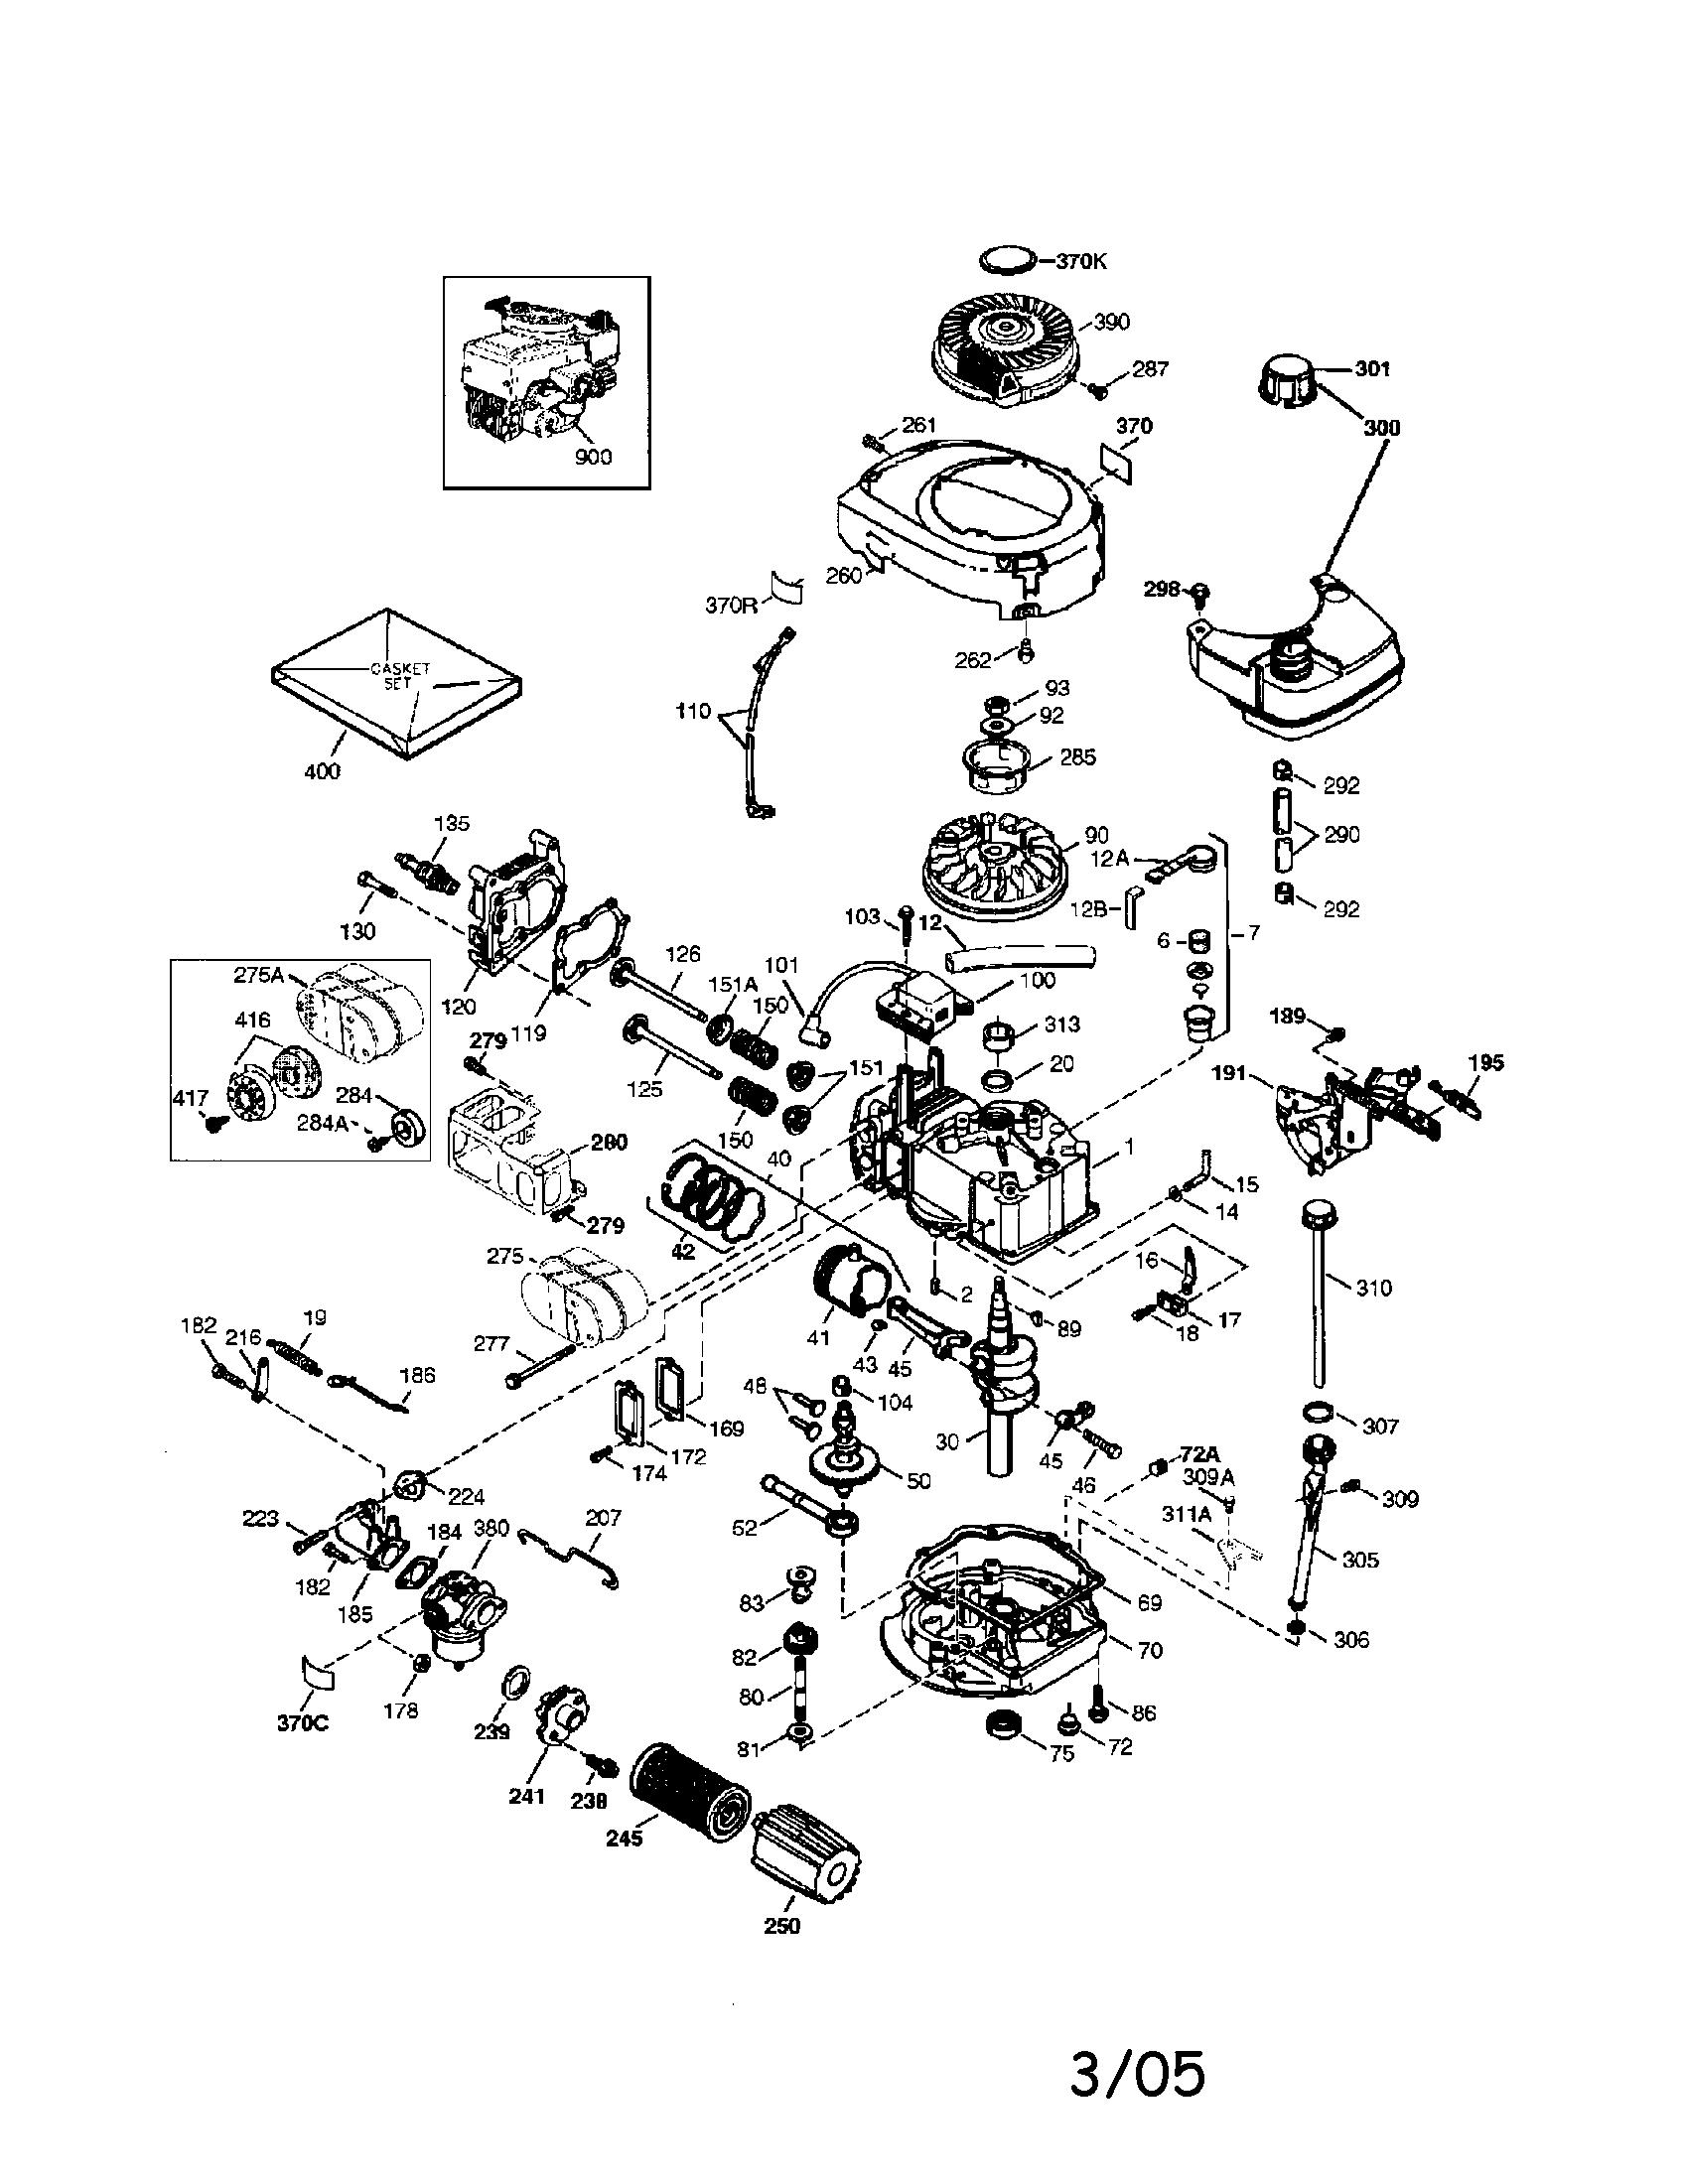 hight resolution of craftsman tecumseh engine parts model 143044500 sears partsdirect rh searspartsdirect com tecumseh 6hp engine diagram tecumseh